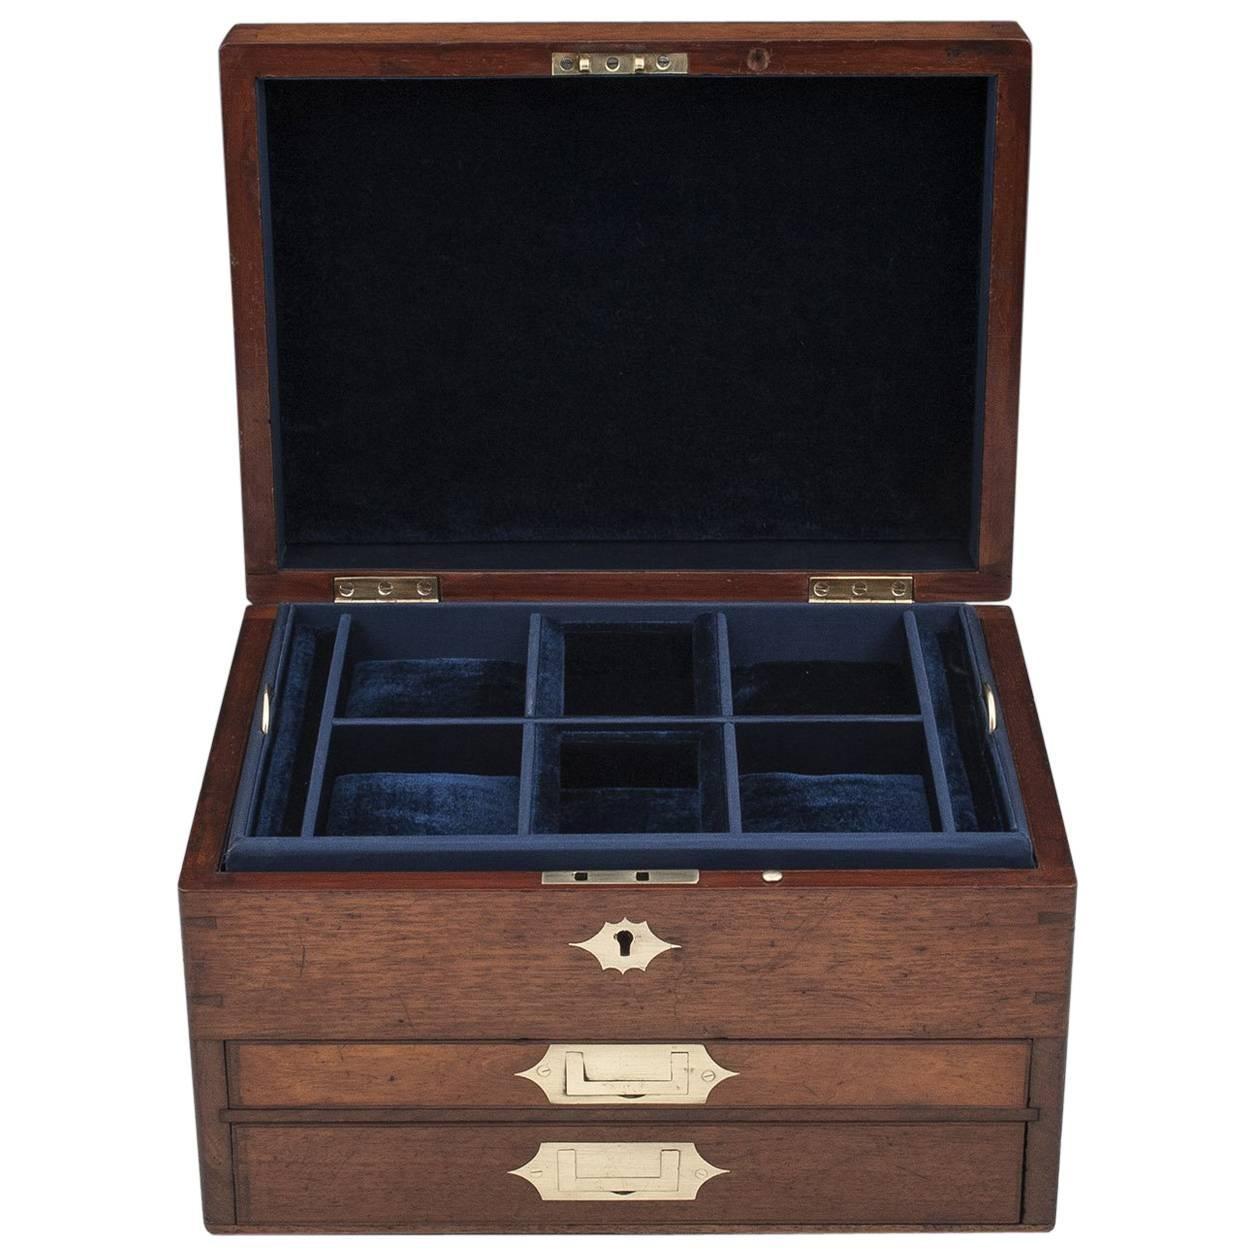 Antique Mahogany Jewelry Box with Velvet Lined Interior 19th